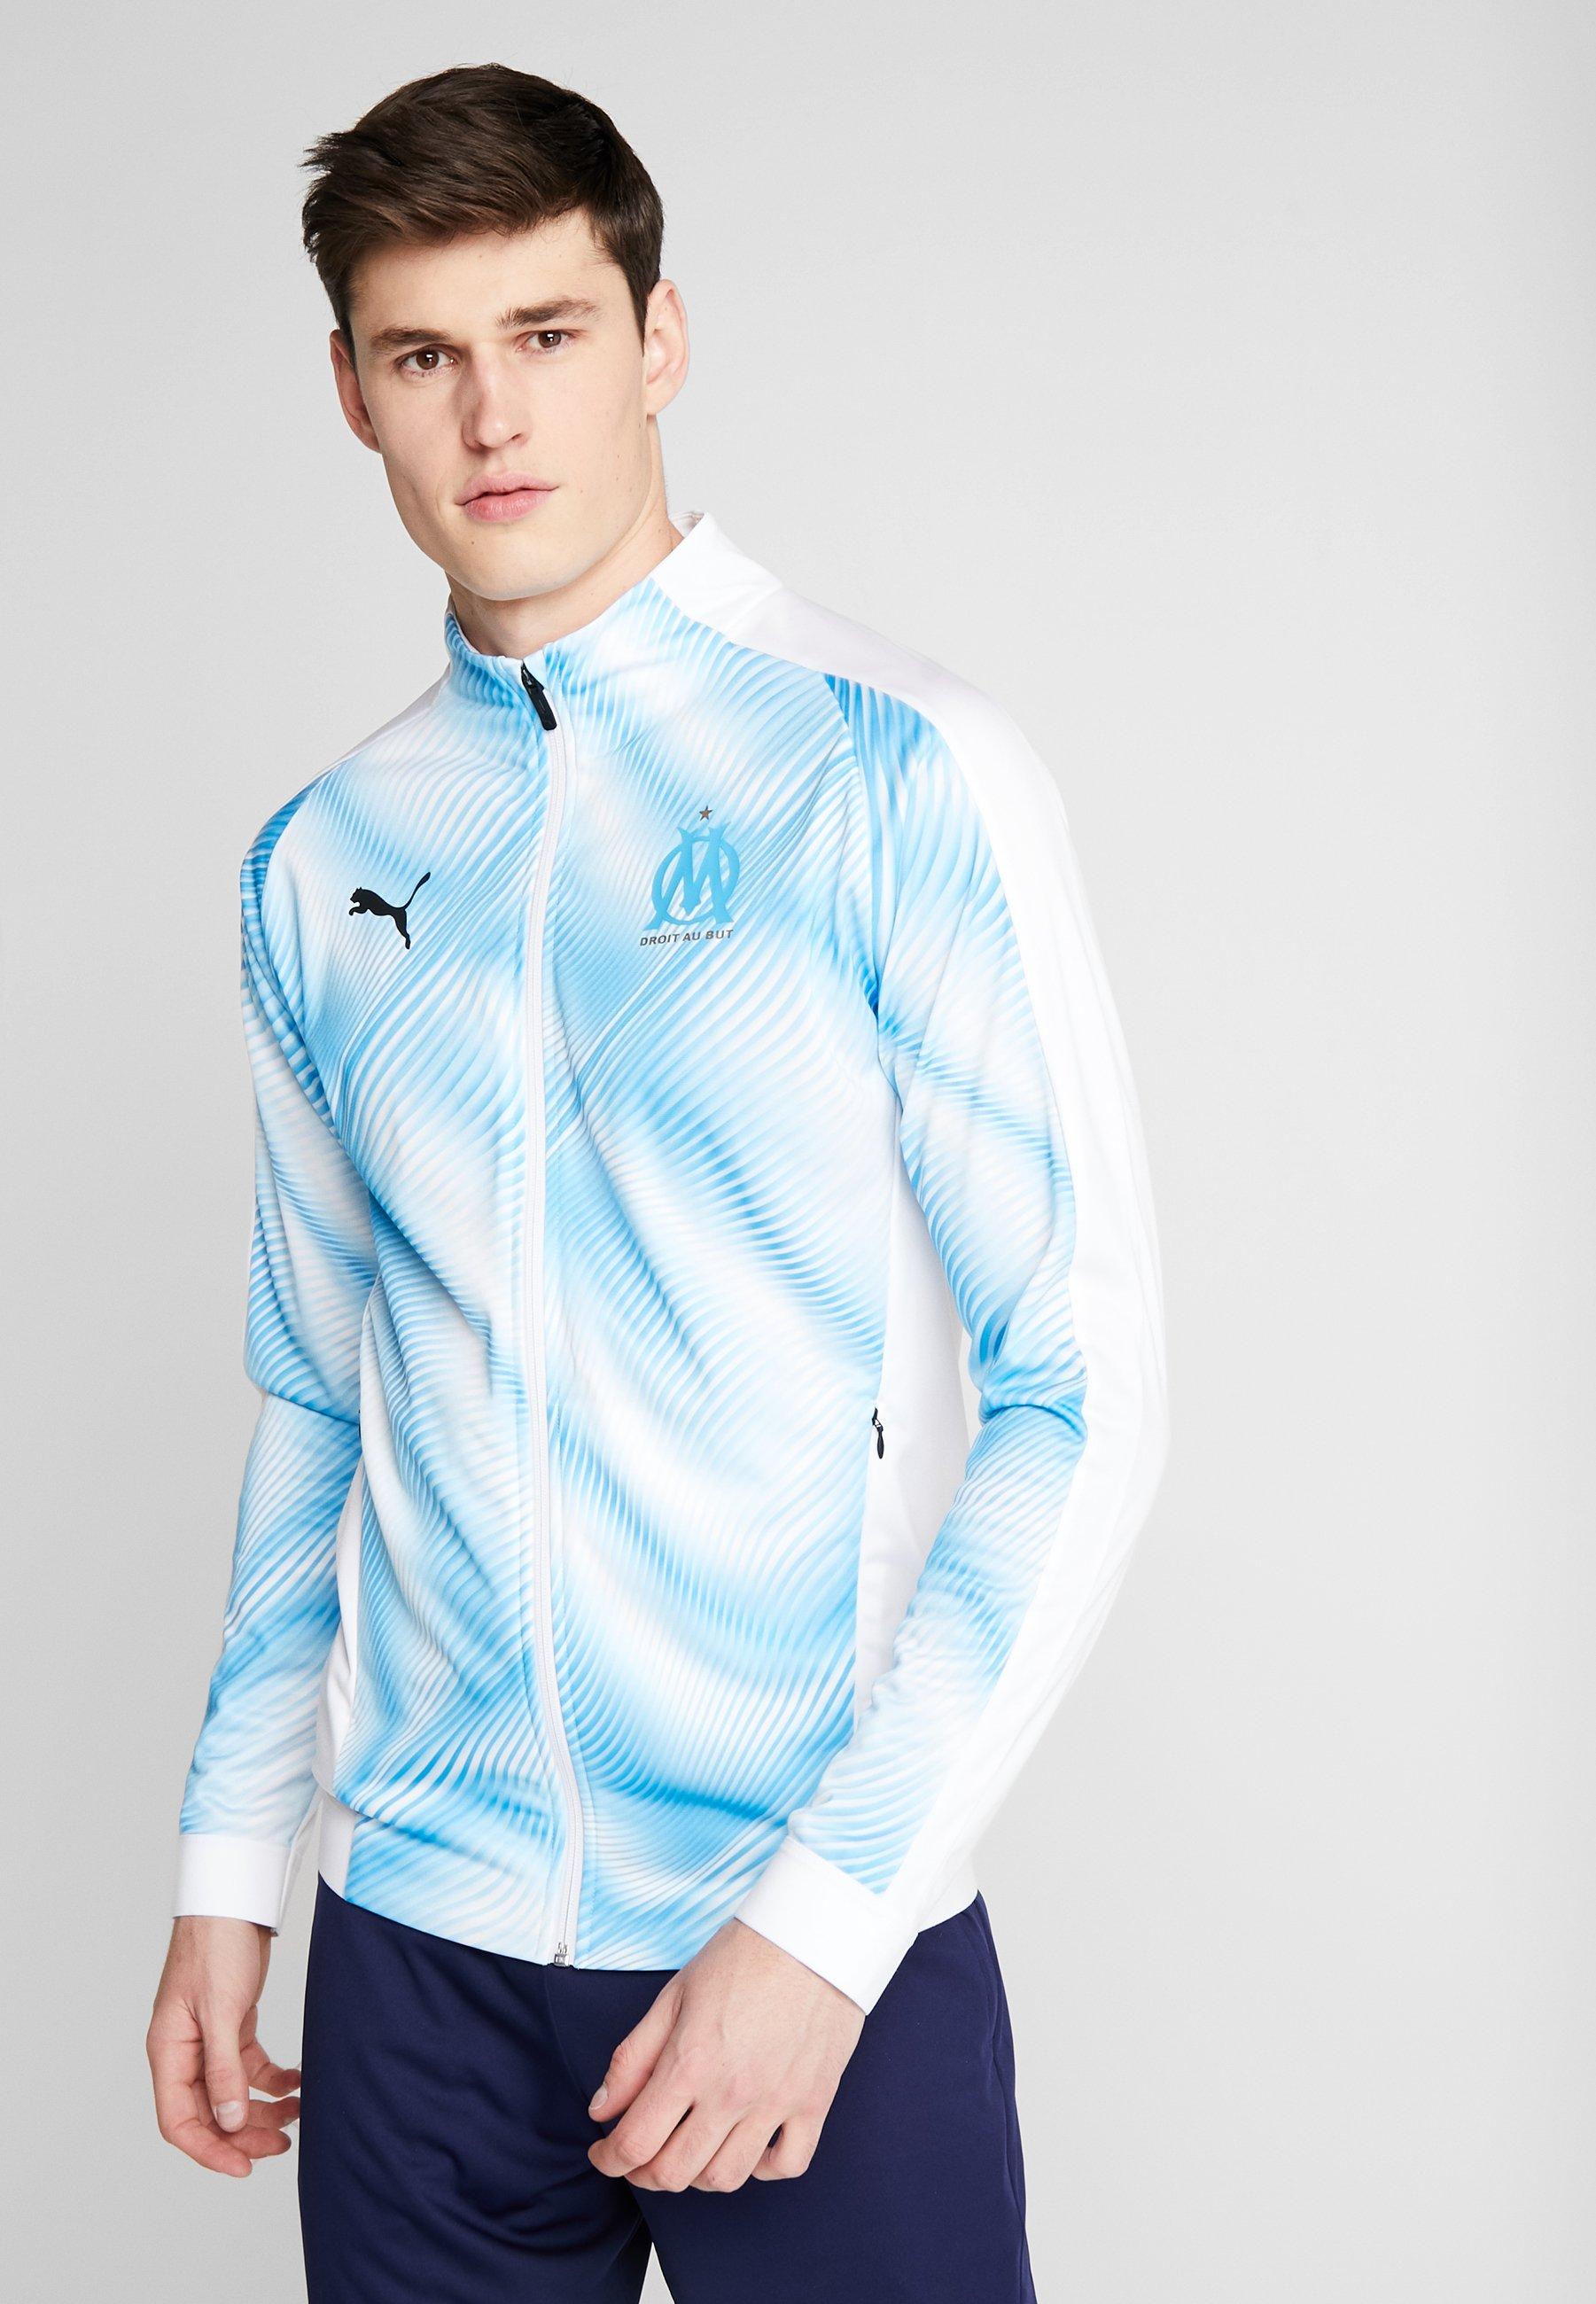 Giacca Tuta Uomo Puma Reactive Wvn Jacket